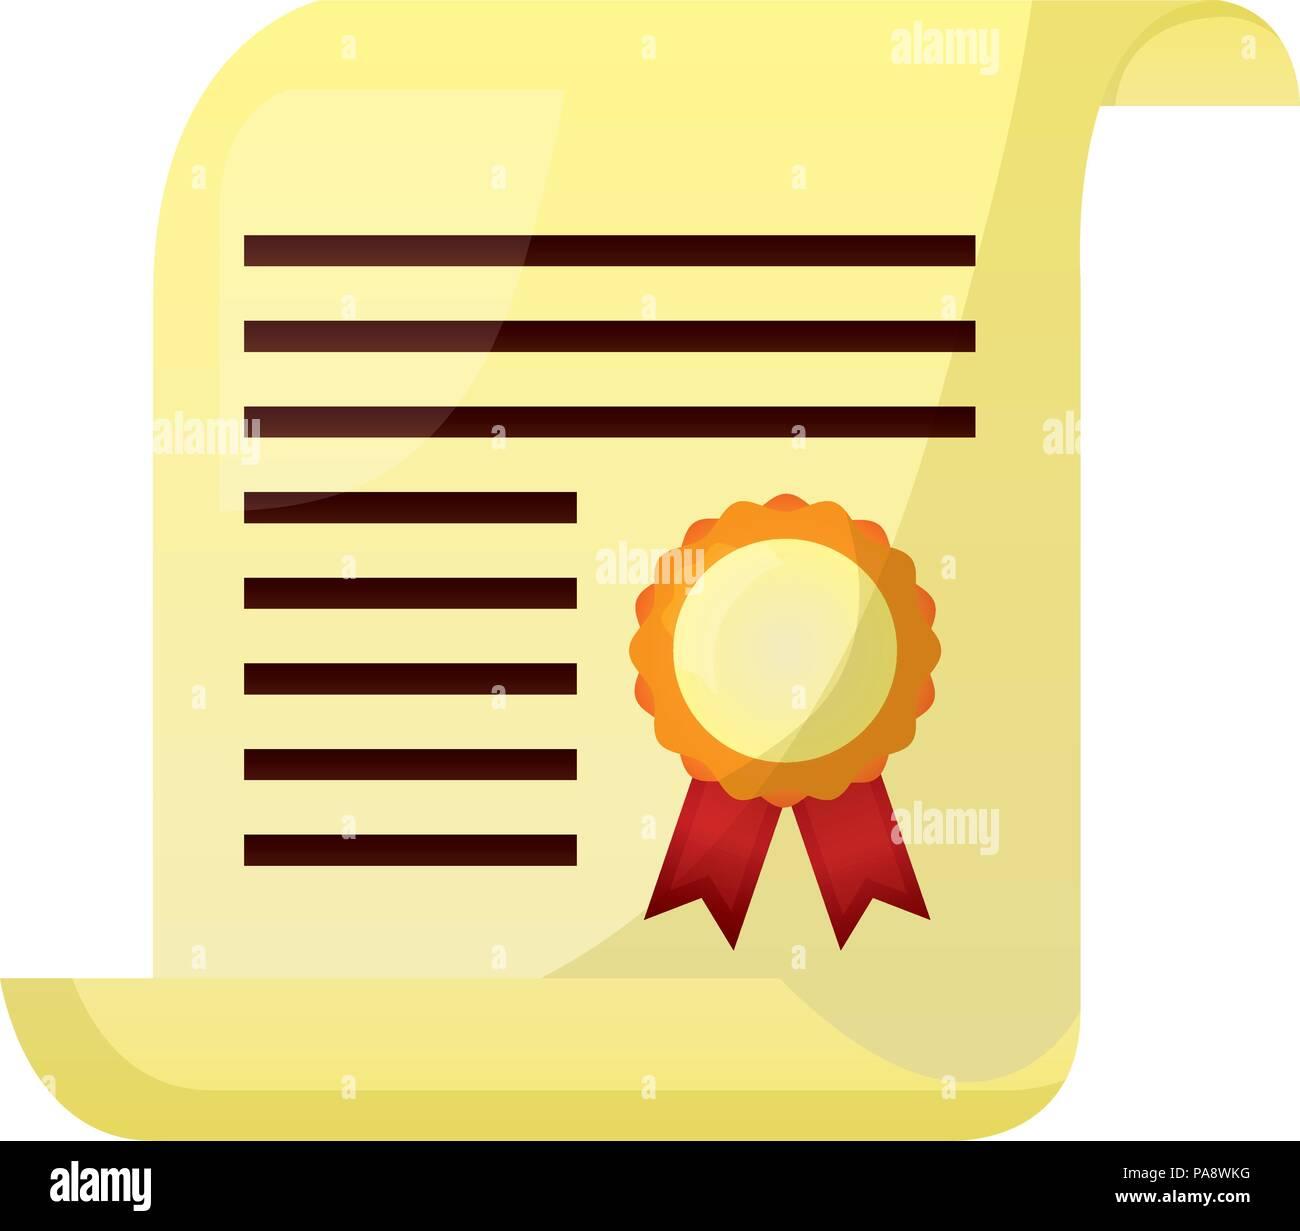 school graduation certificate diploma document - Stock Image